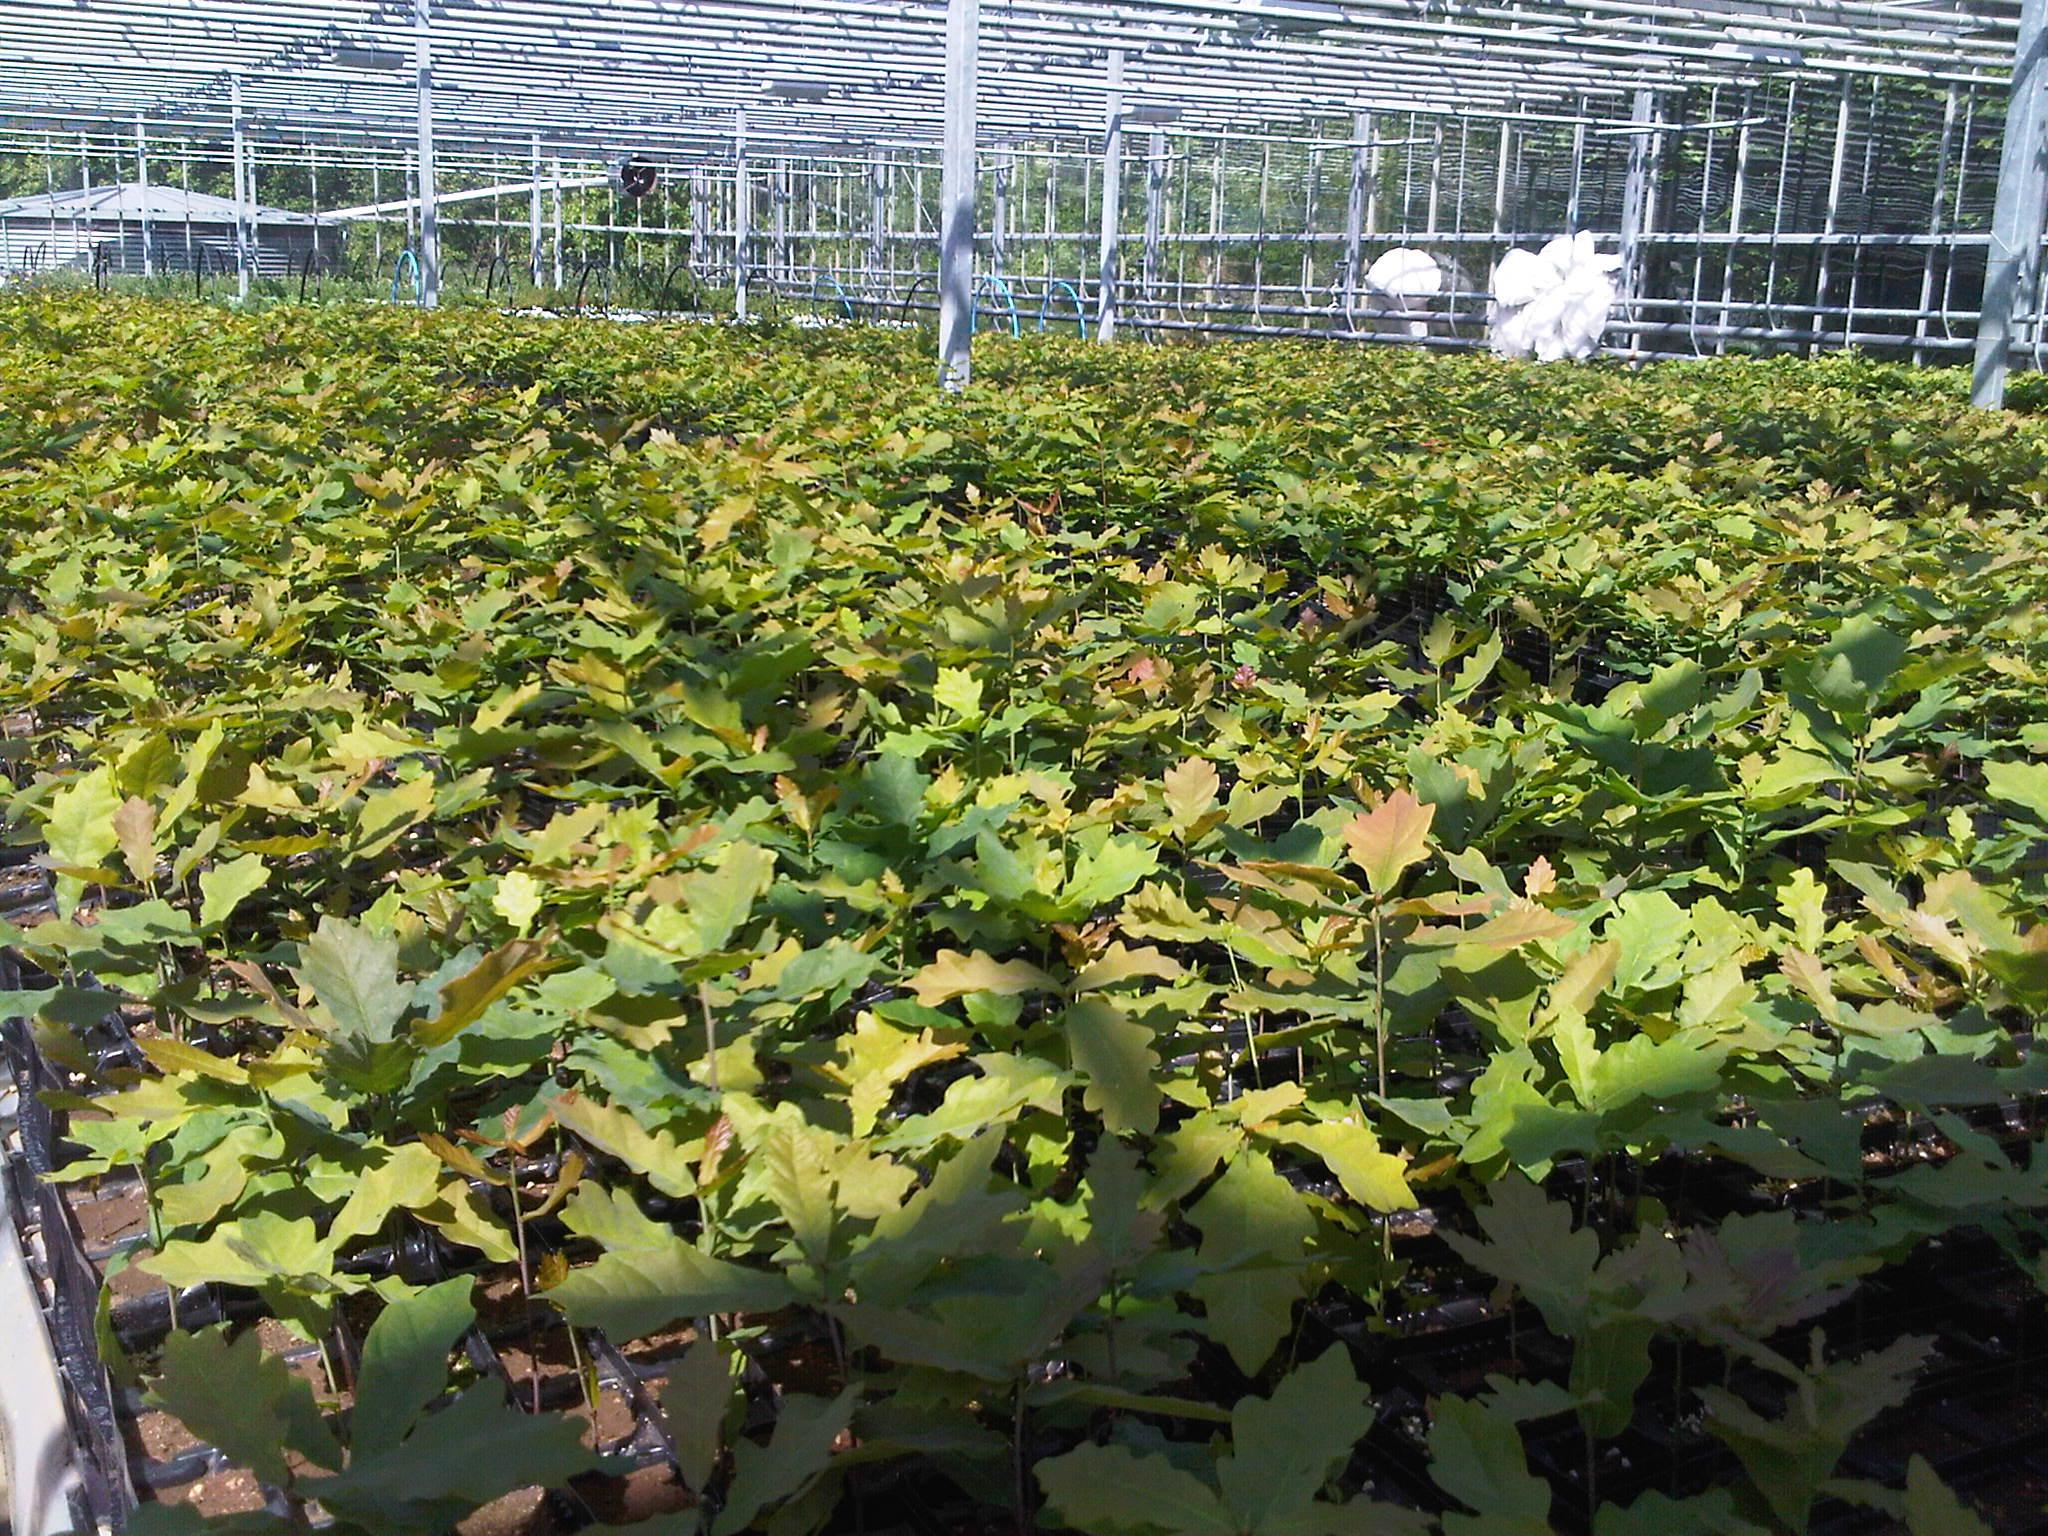 Mycorrhizal Systems' English truffle tree nursery in Lancashire